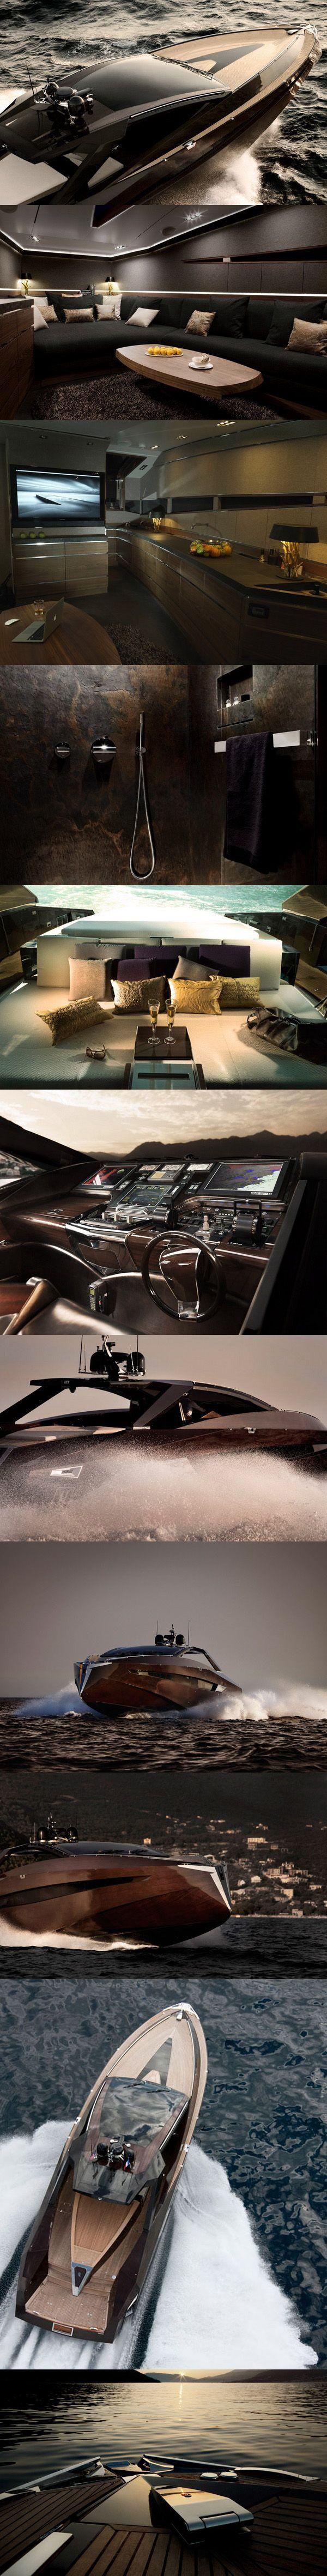 15 luxury sailing yachts photos to keep you inspired 15-luxury-sailing-yachts-photos-to-keep-you-inspired-8